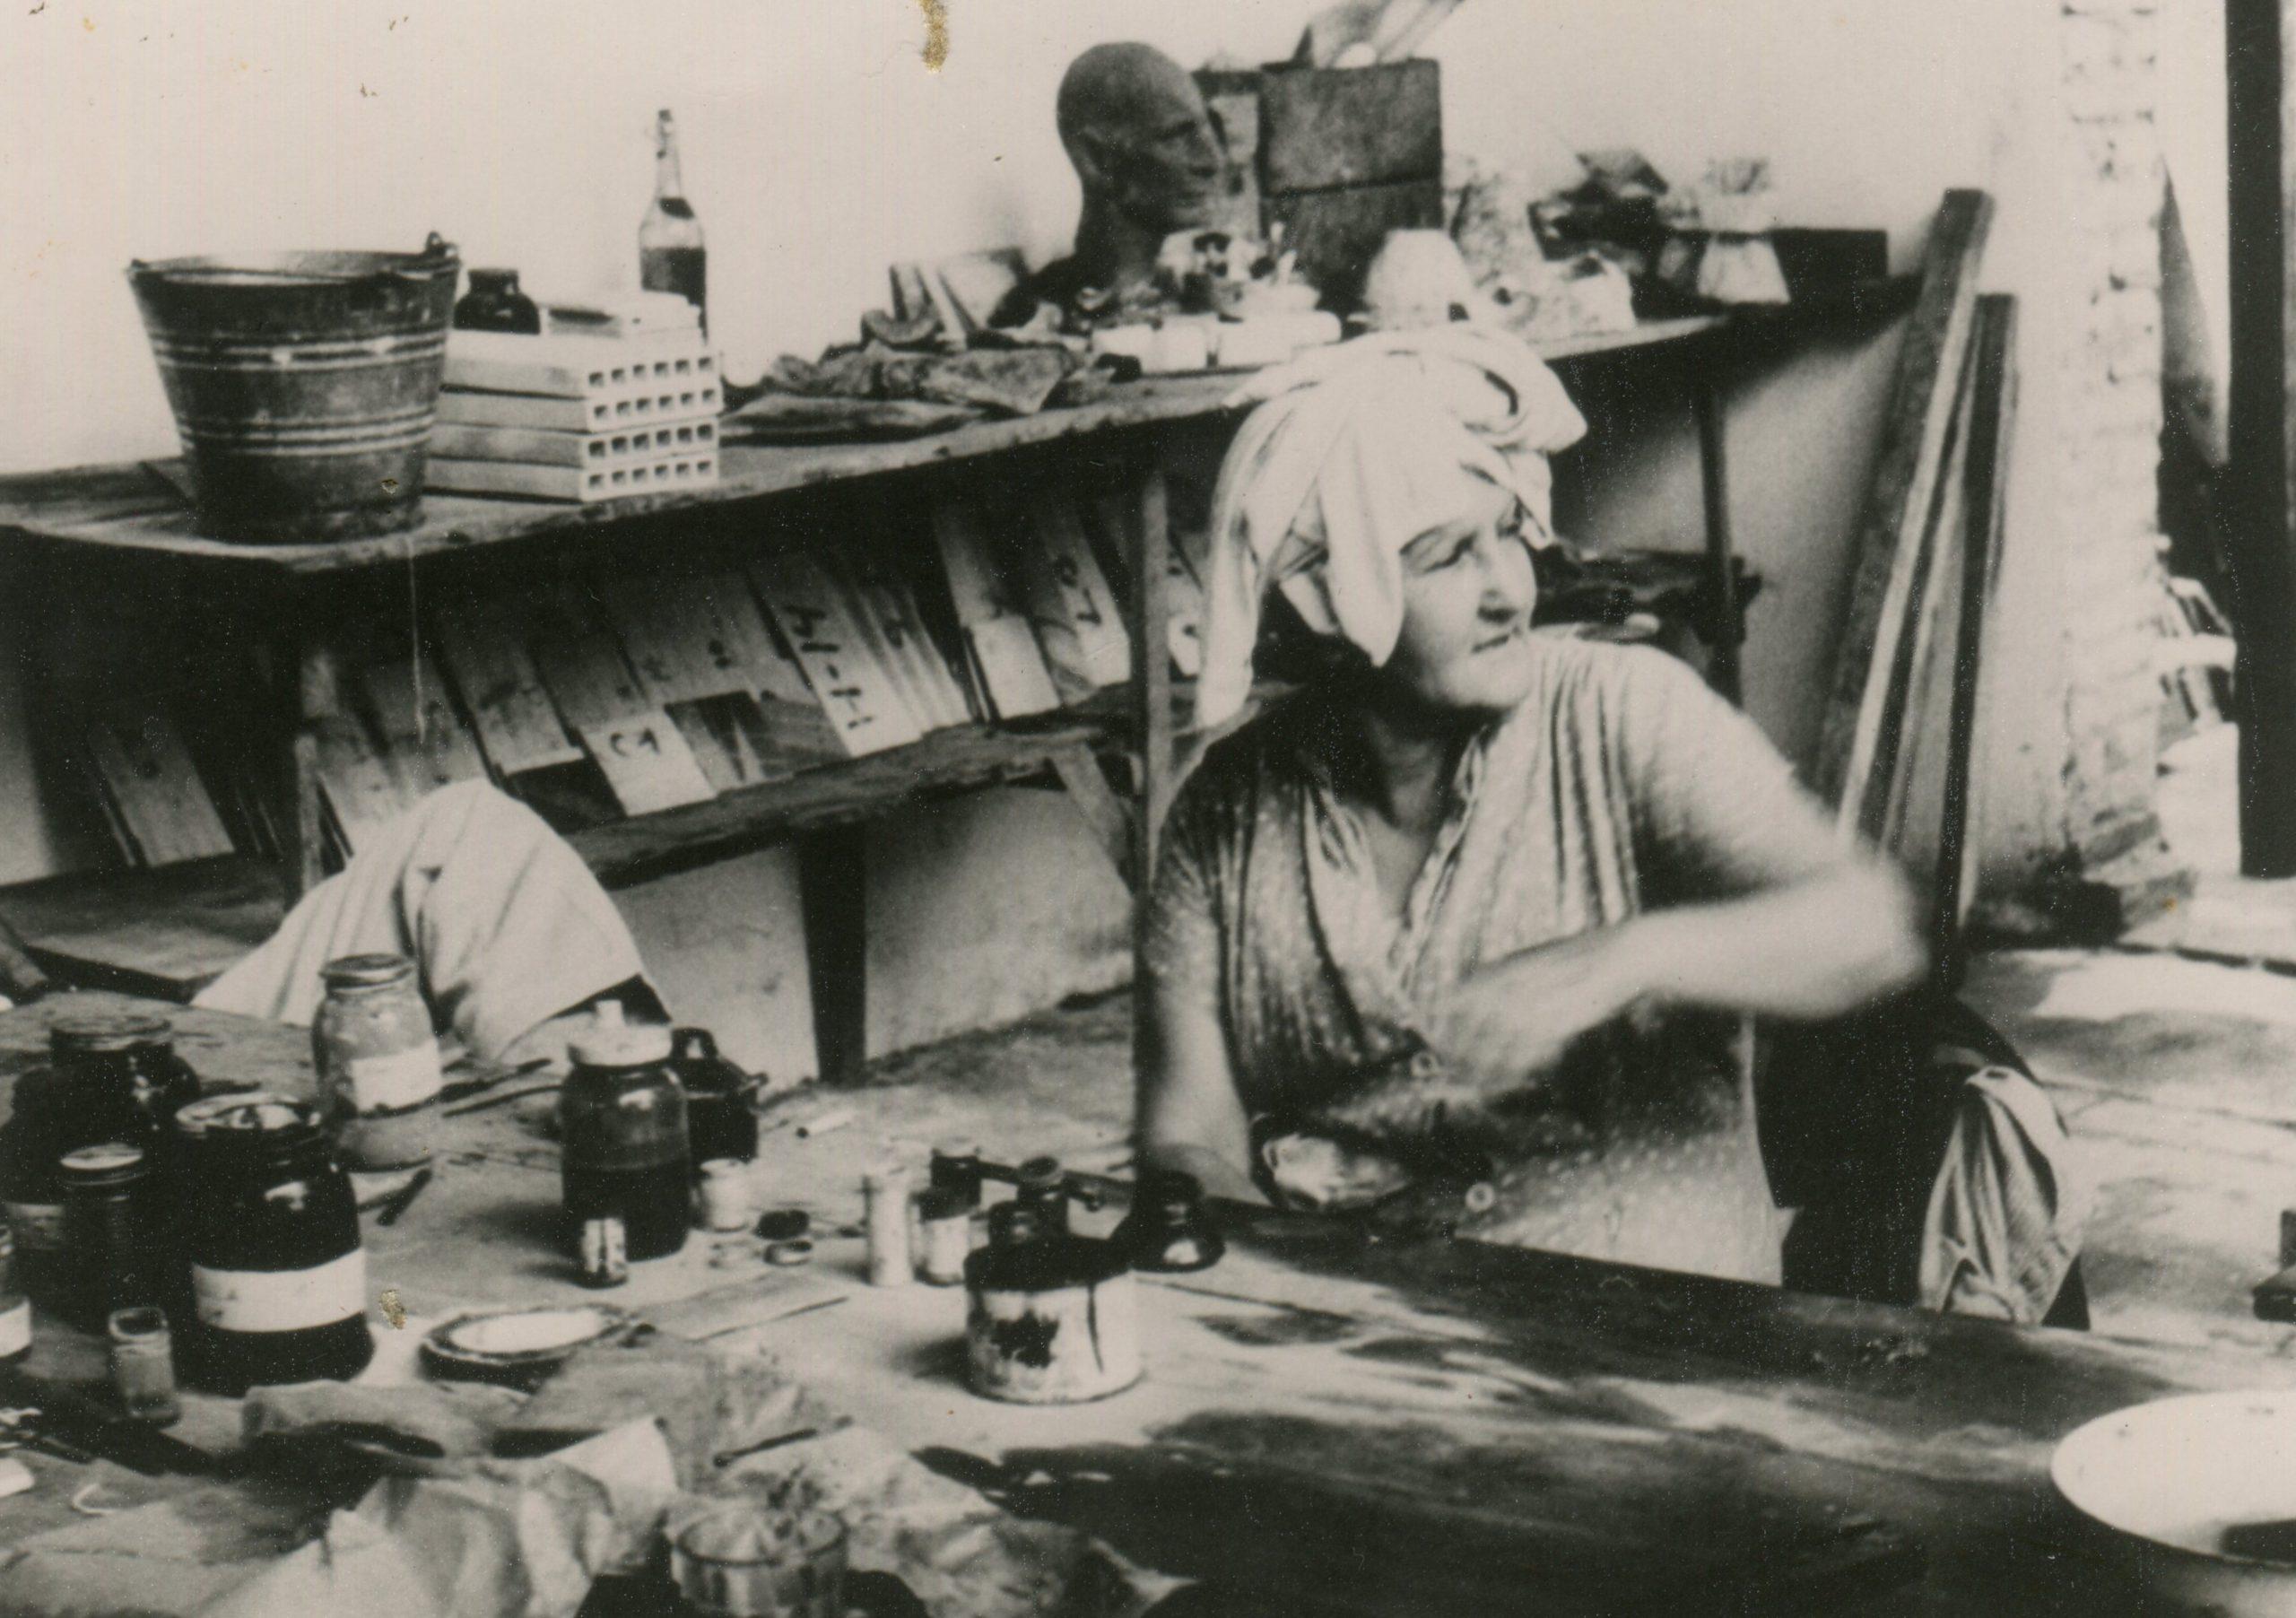 Josefina en su taller (Gentileza CCEJS)